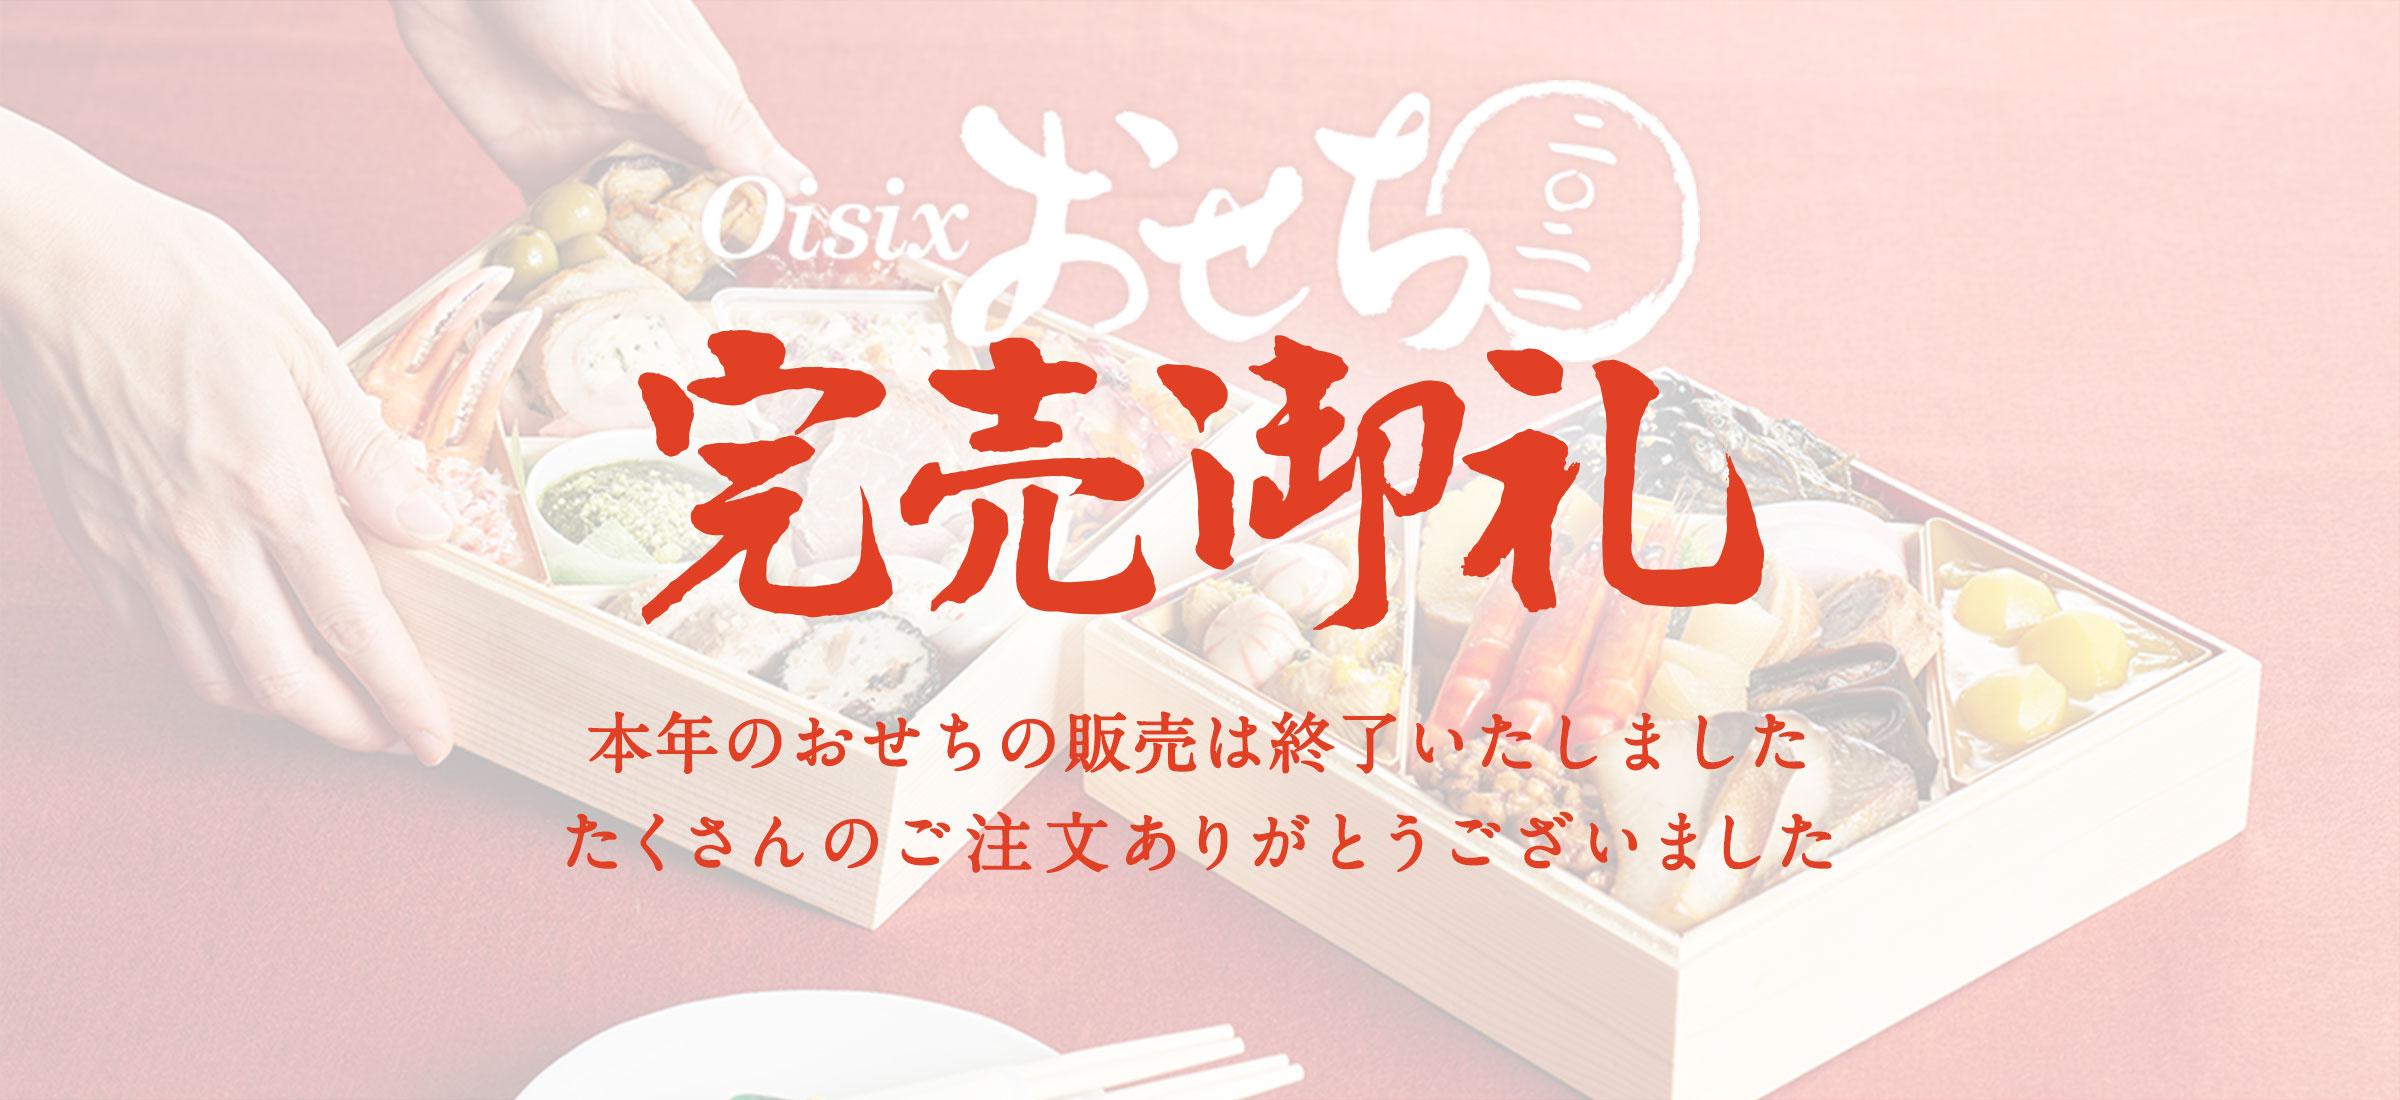 Oisixおせち2021のイメージ画像